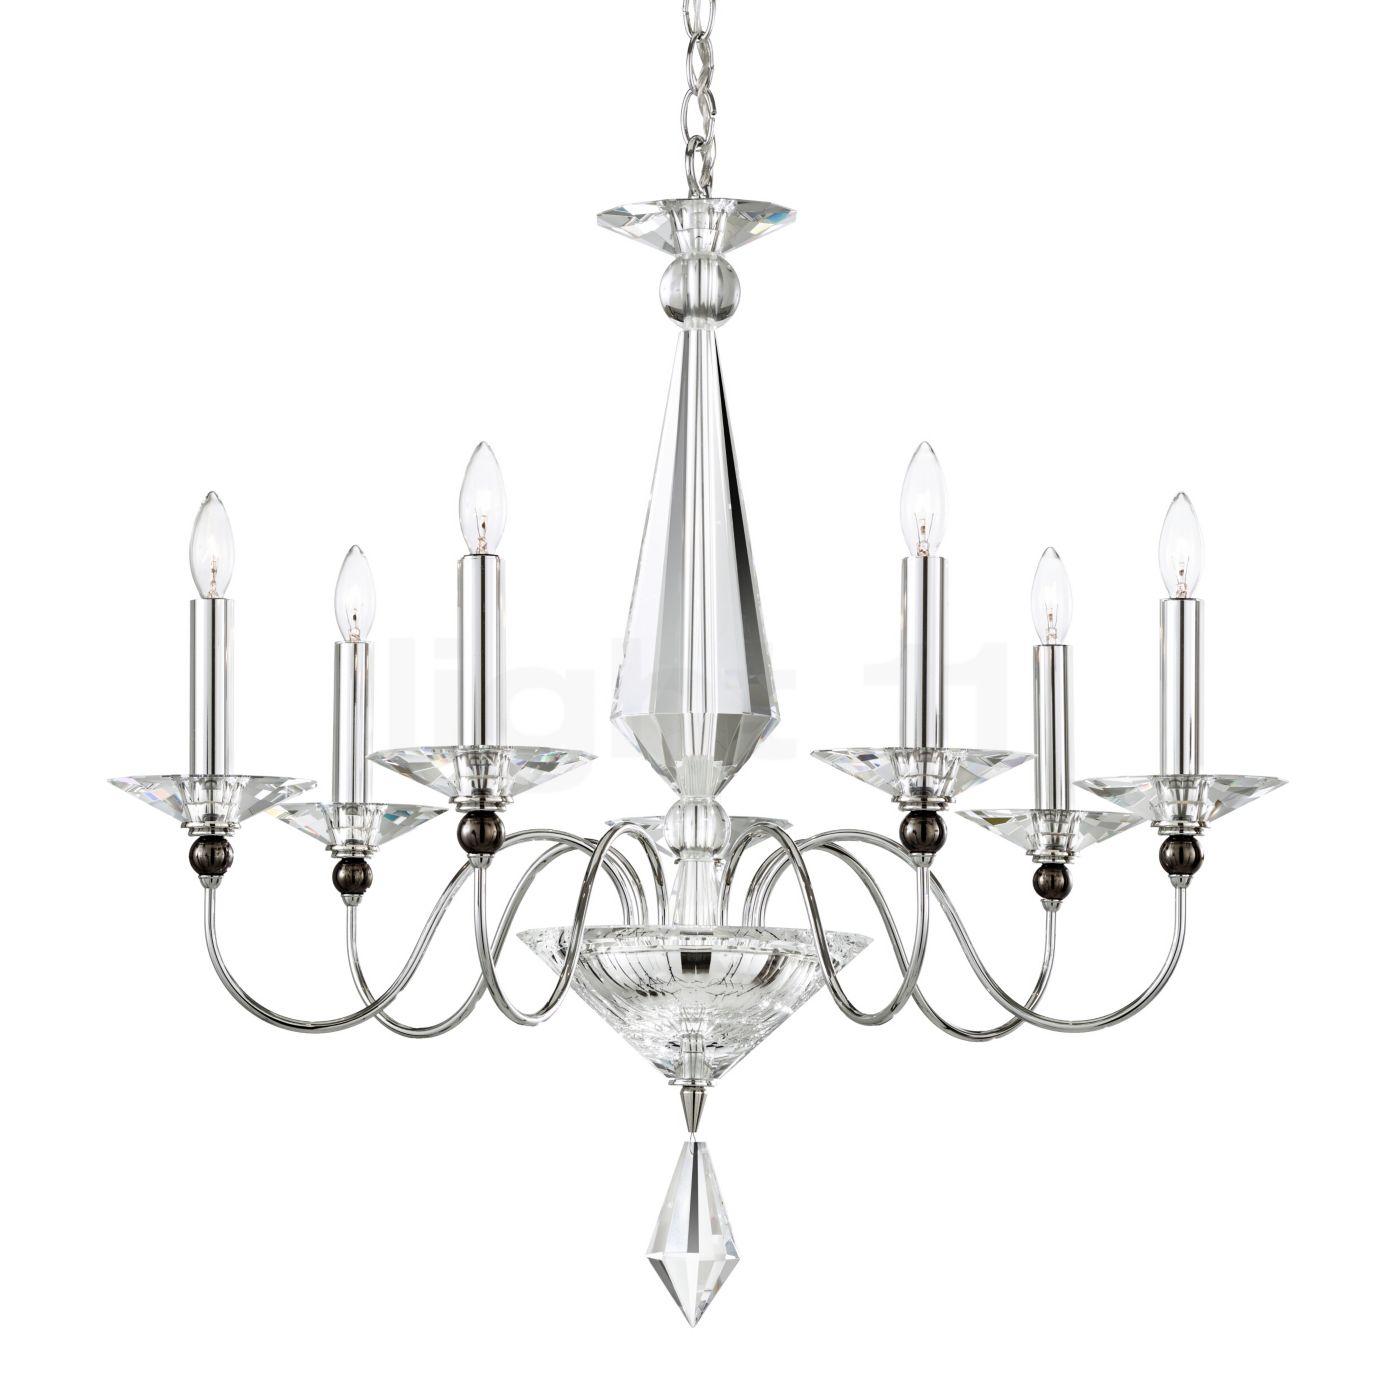 Buy schonbek jasmine 9677 chandelier at light11 aloadofball Choice Image